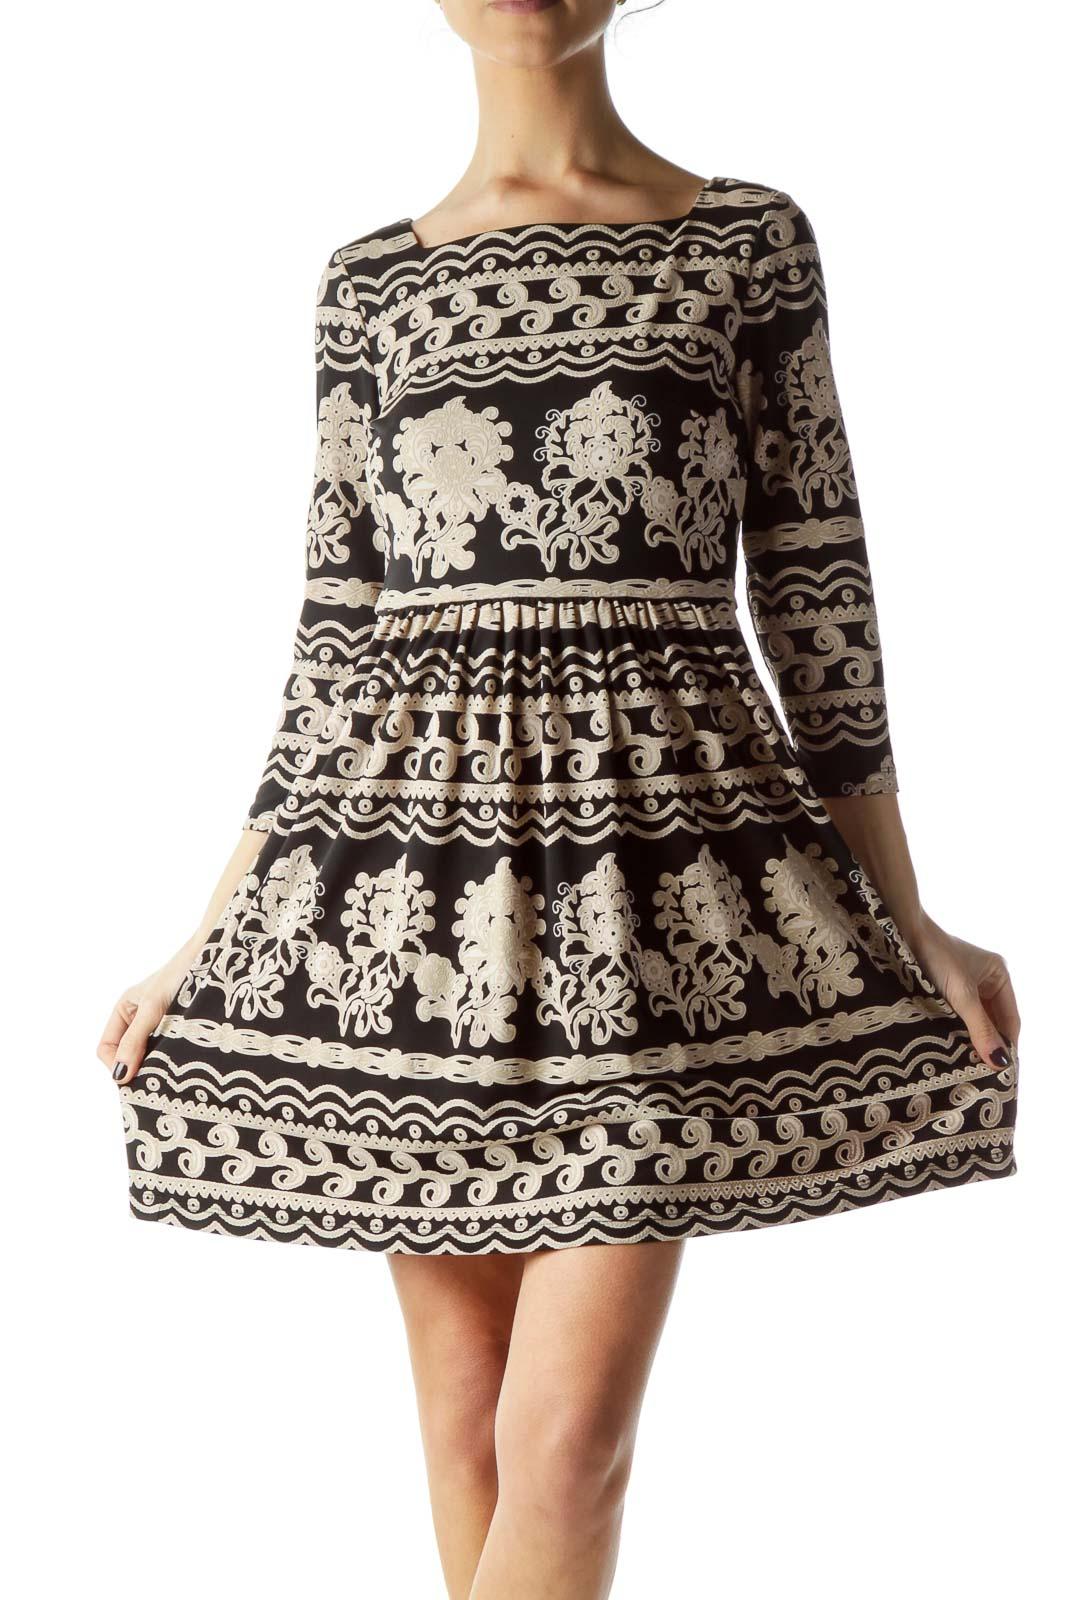 Black Beige Print 3/4 Sleeve Dress Front